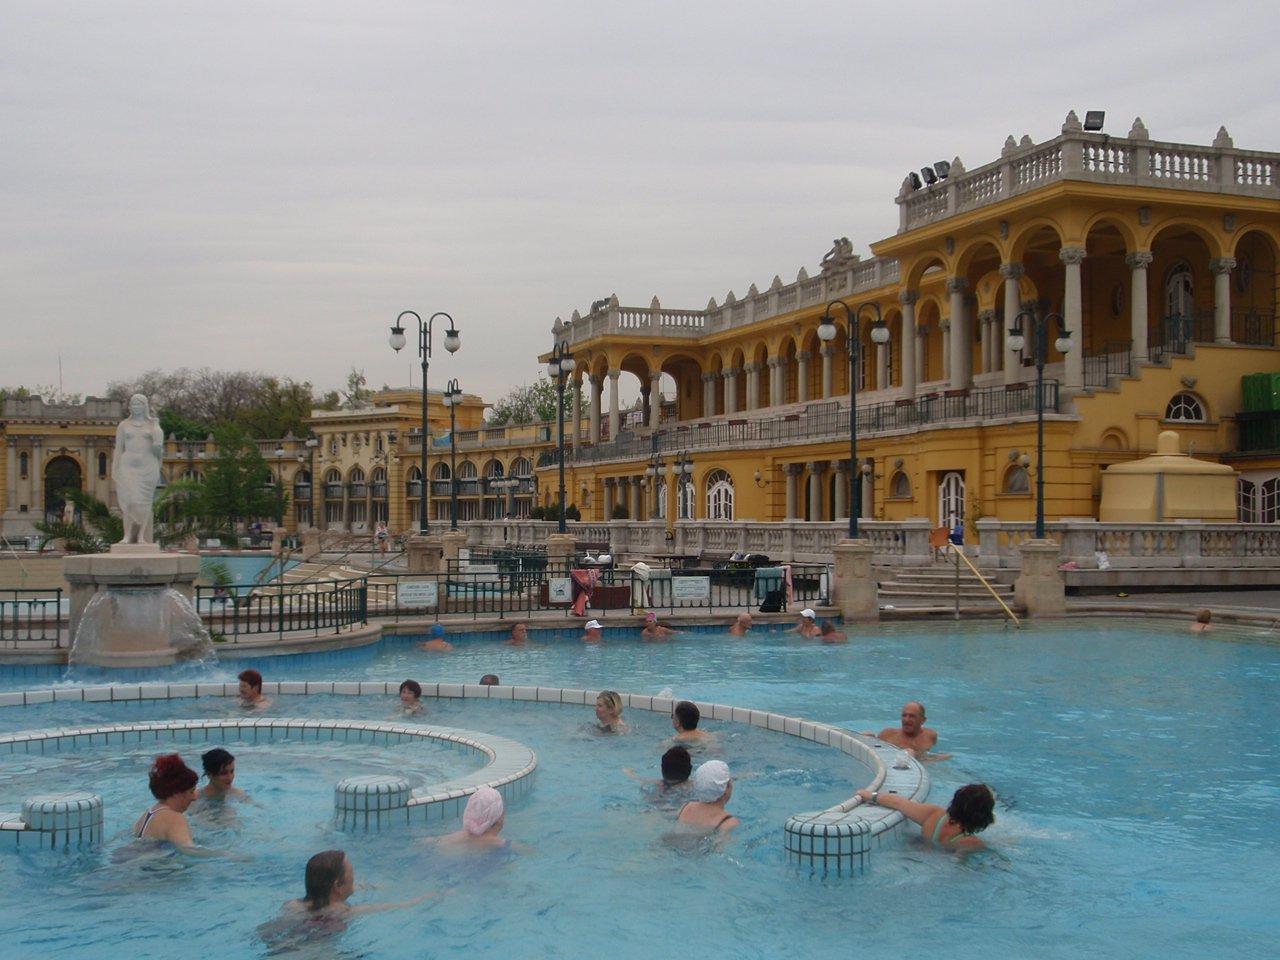 Bagni Termali Di Rudas Budapest : Le terme di budapest una città piena di bellezza e di acqua termale